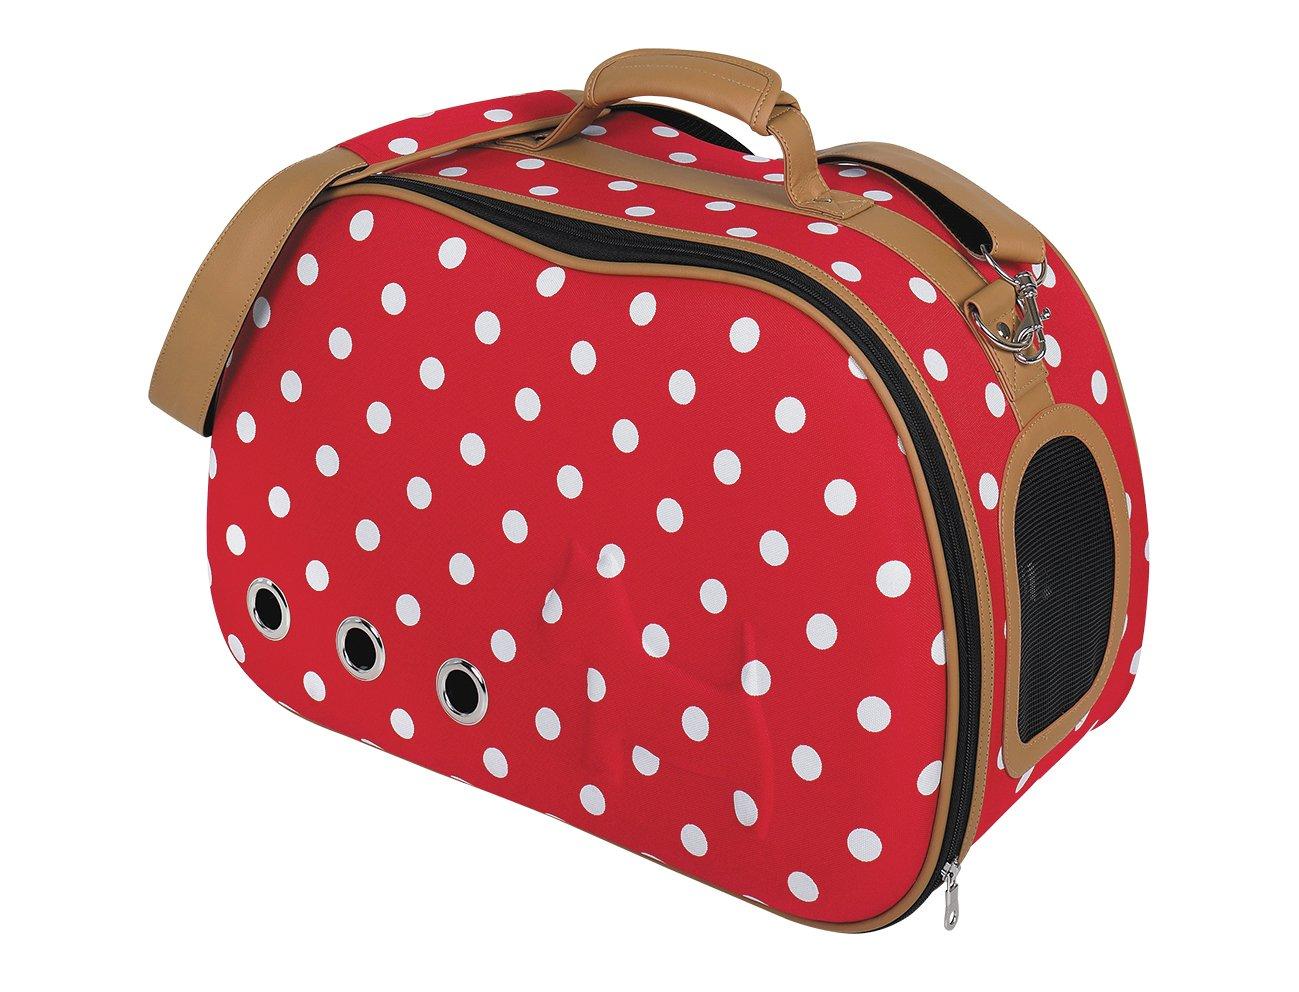 Red 50 x 20 x 31 cm Red 50 x 20 x 31 cm Nobby Bag Bella, 50 x 20 x 31 cm, Red